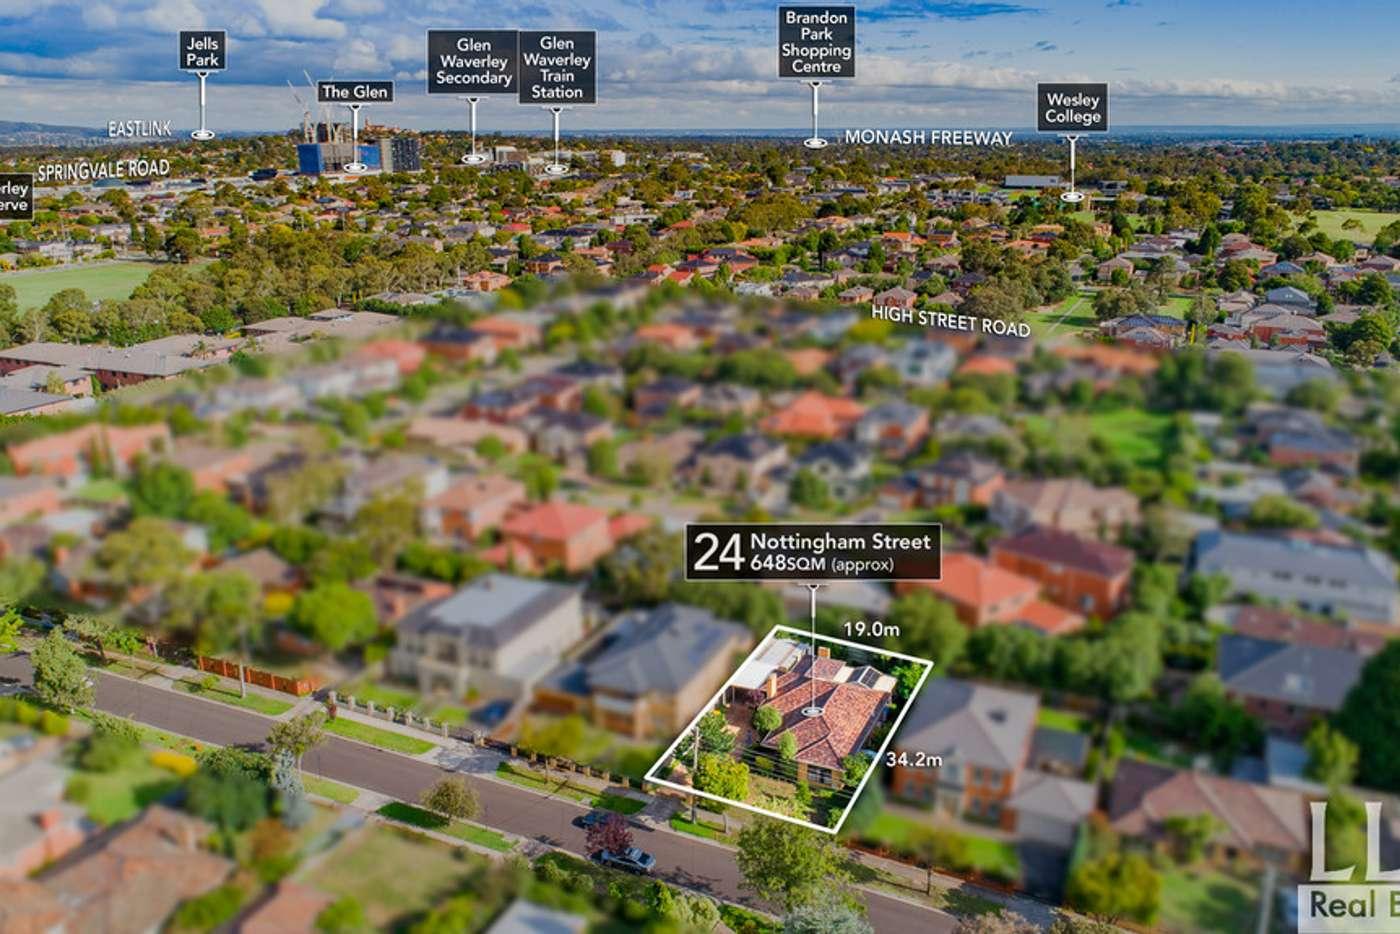 Main view of Homely house listing, 24 Nottingham Street, Glen Waverley VIC 3150